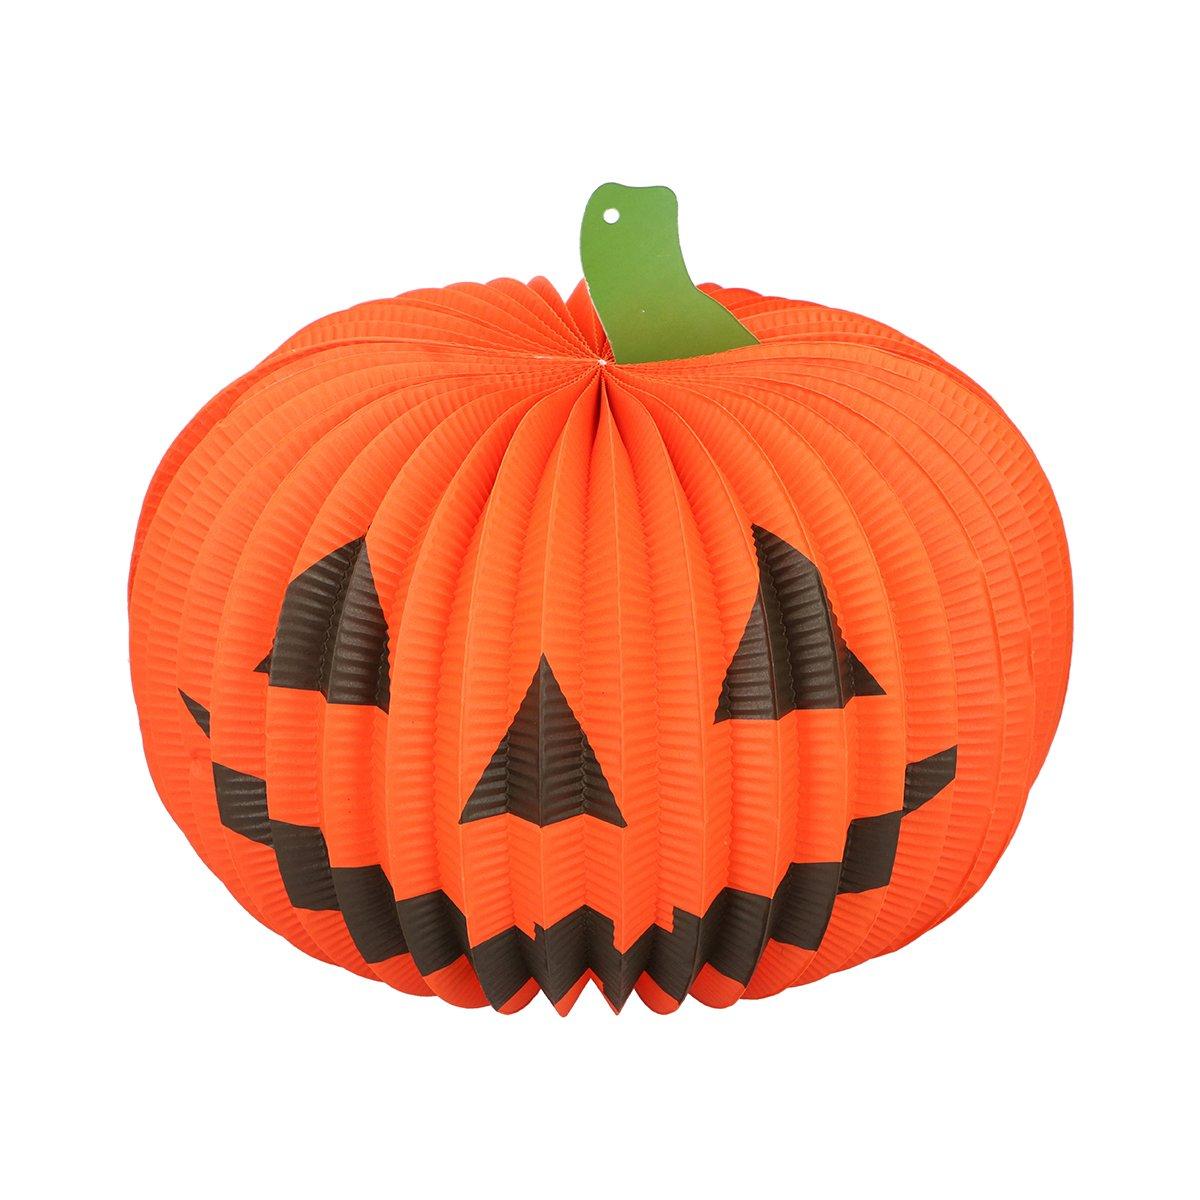 Decoratiune luminoasa dovleac halloween Edco, 35 cm imagine